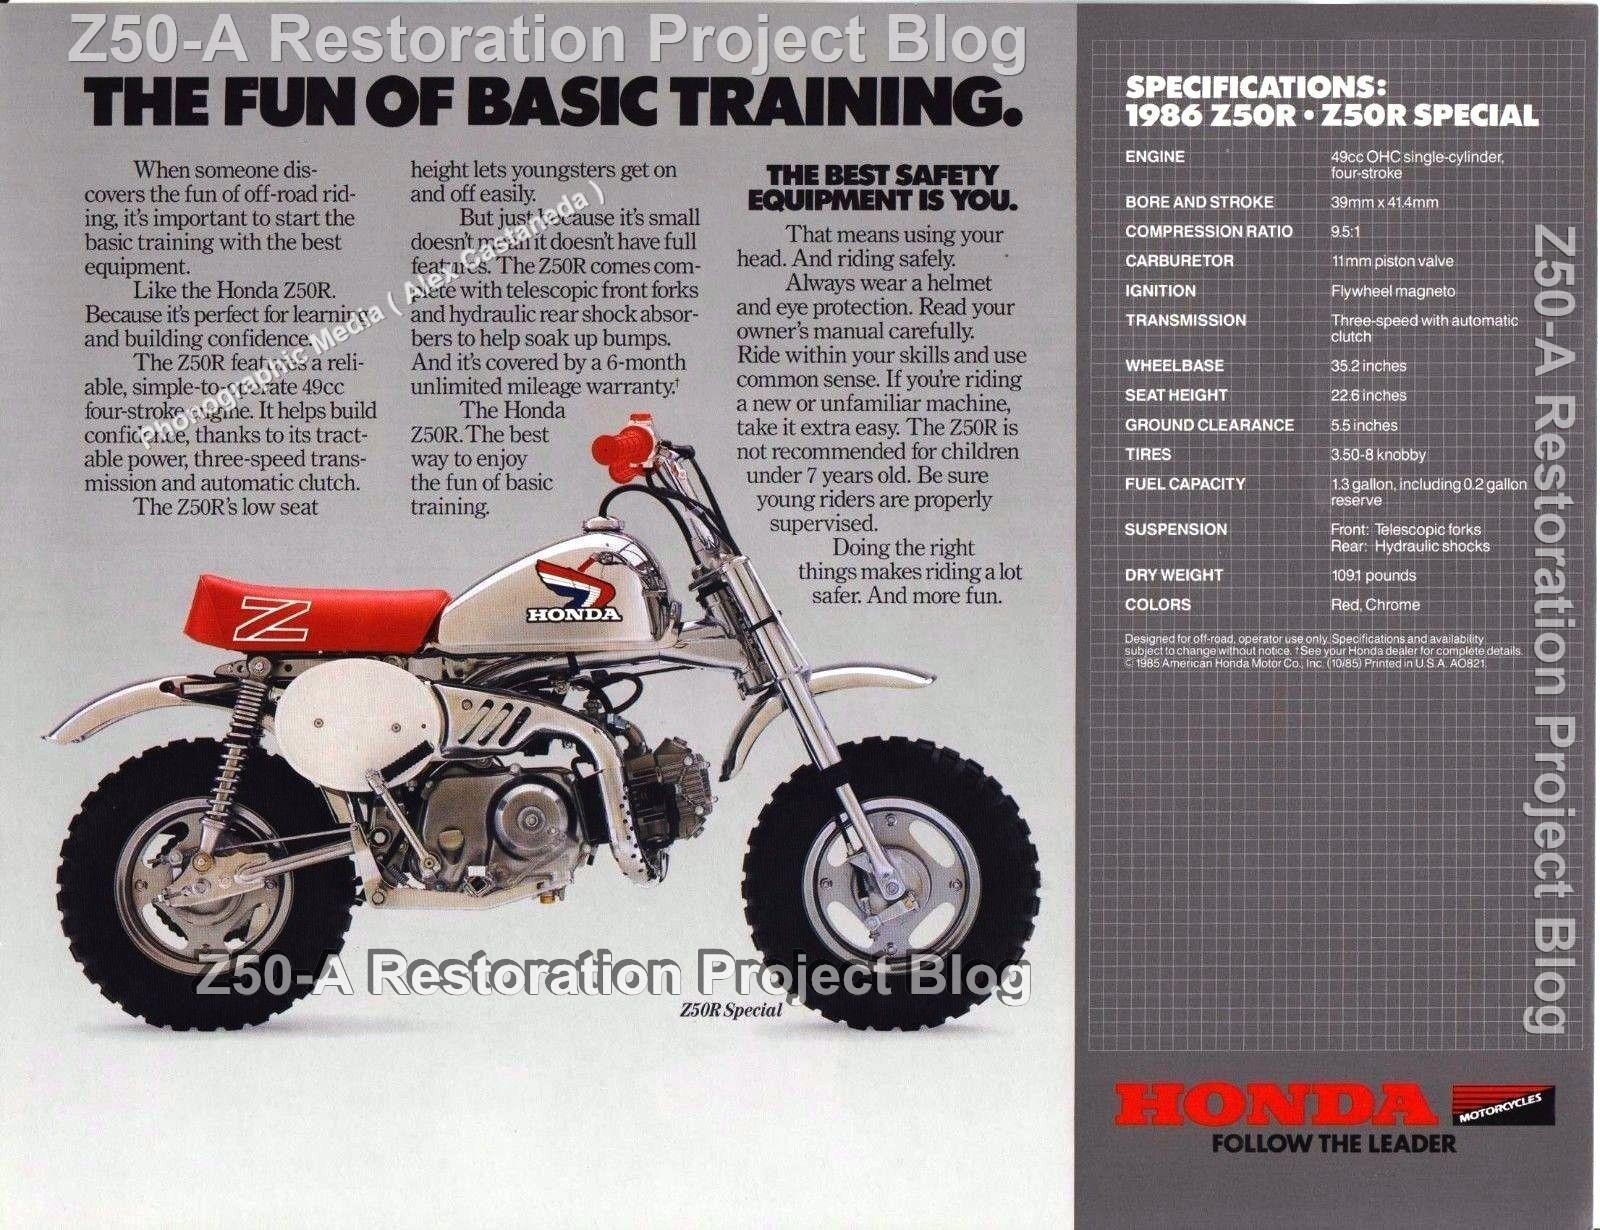 brochure 1986 z50 rd christmas special 30 year anniversary rh z50a restoration project blogspot com honda z50 manual clutch kit honda z50 manual clutch kit